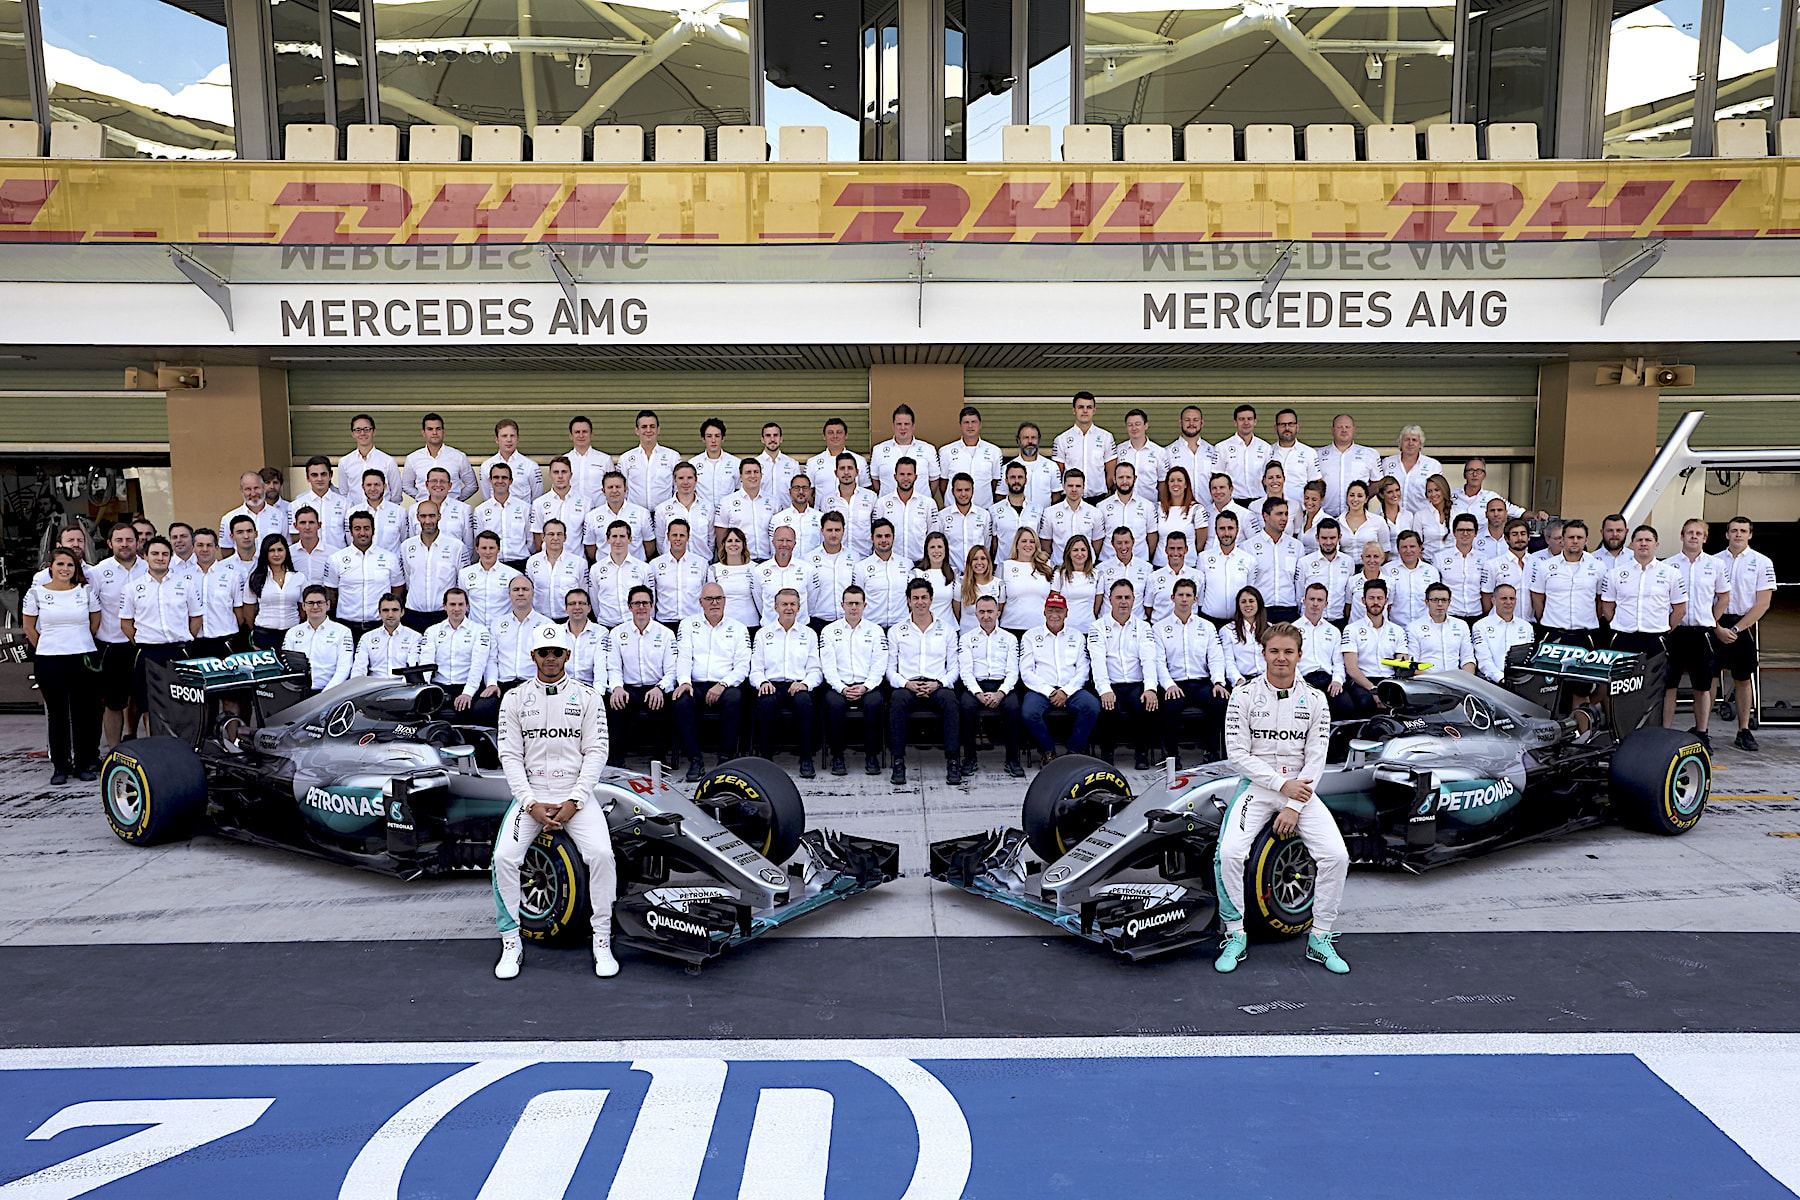 2016 World Constructors' Champions: 🇩🇪 Mercedes AMG Petronas